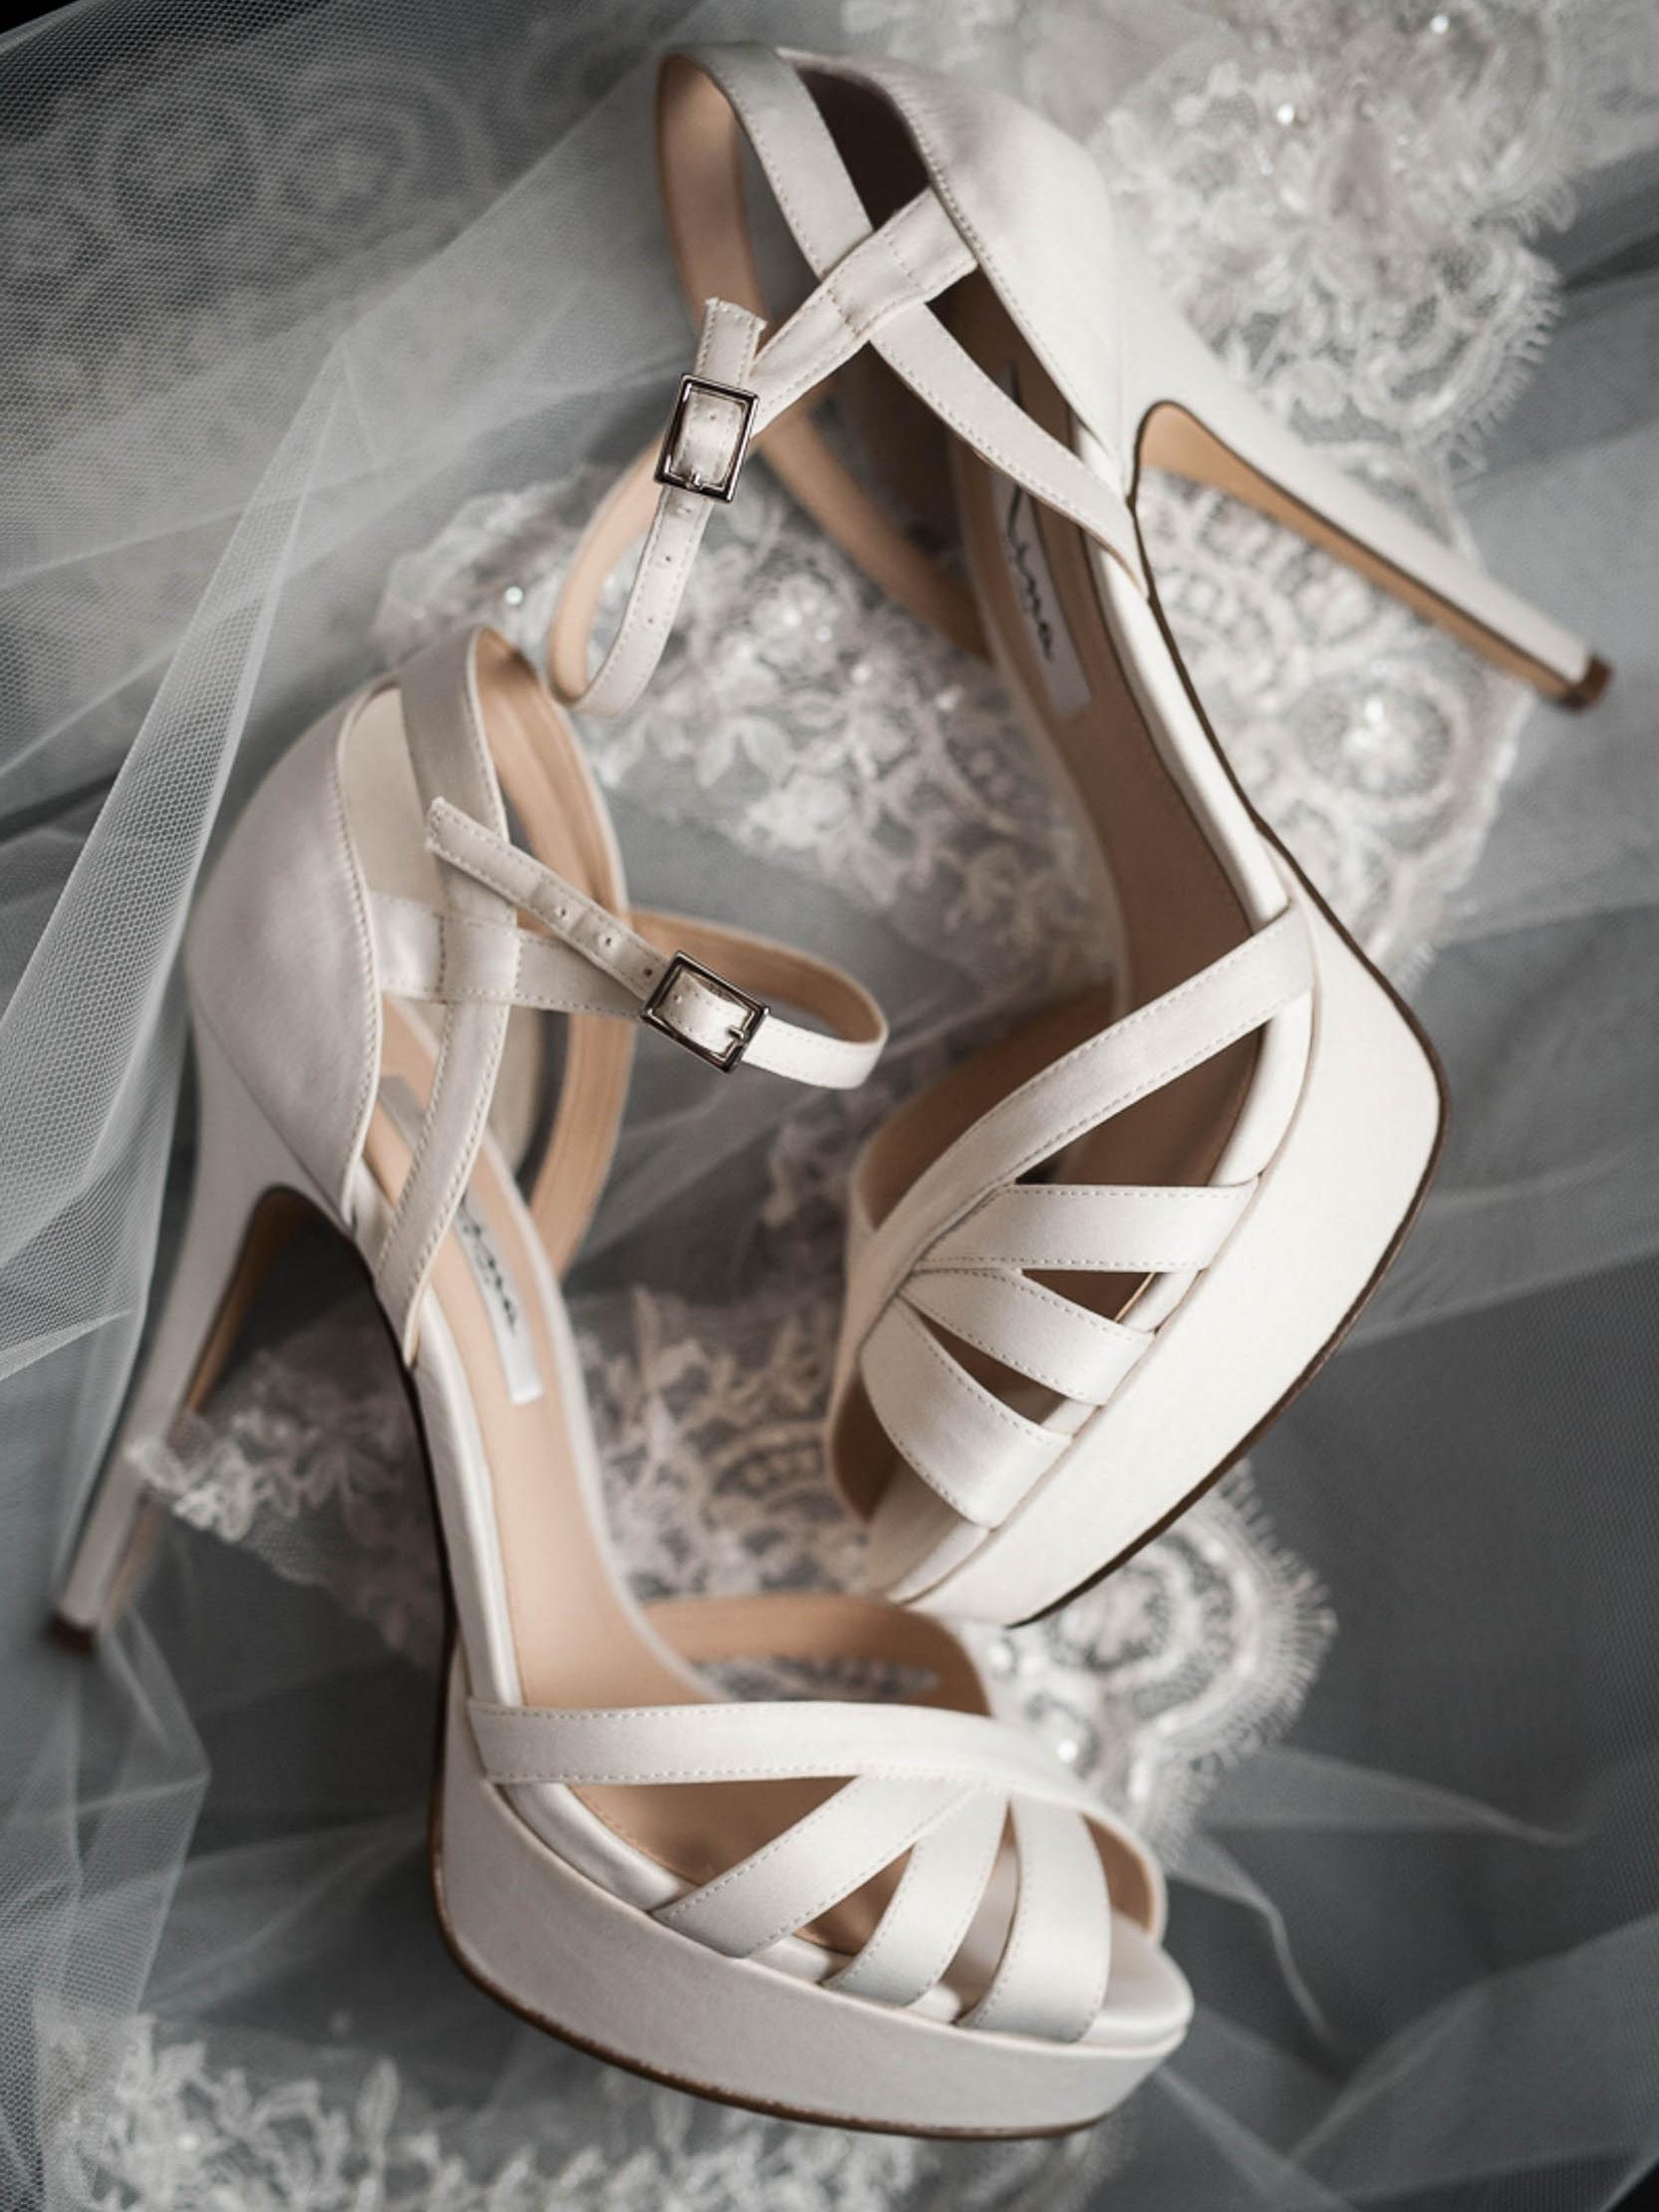 STRATOS & ADEL - Elegant γάμος στην Αθηναϊκή Ριβιέρα